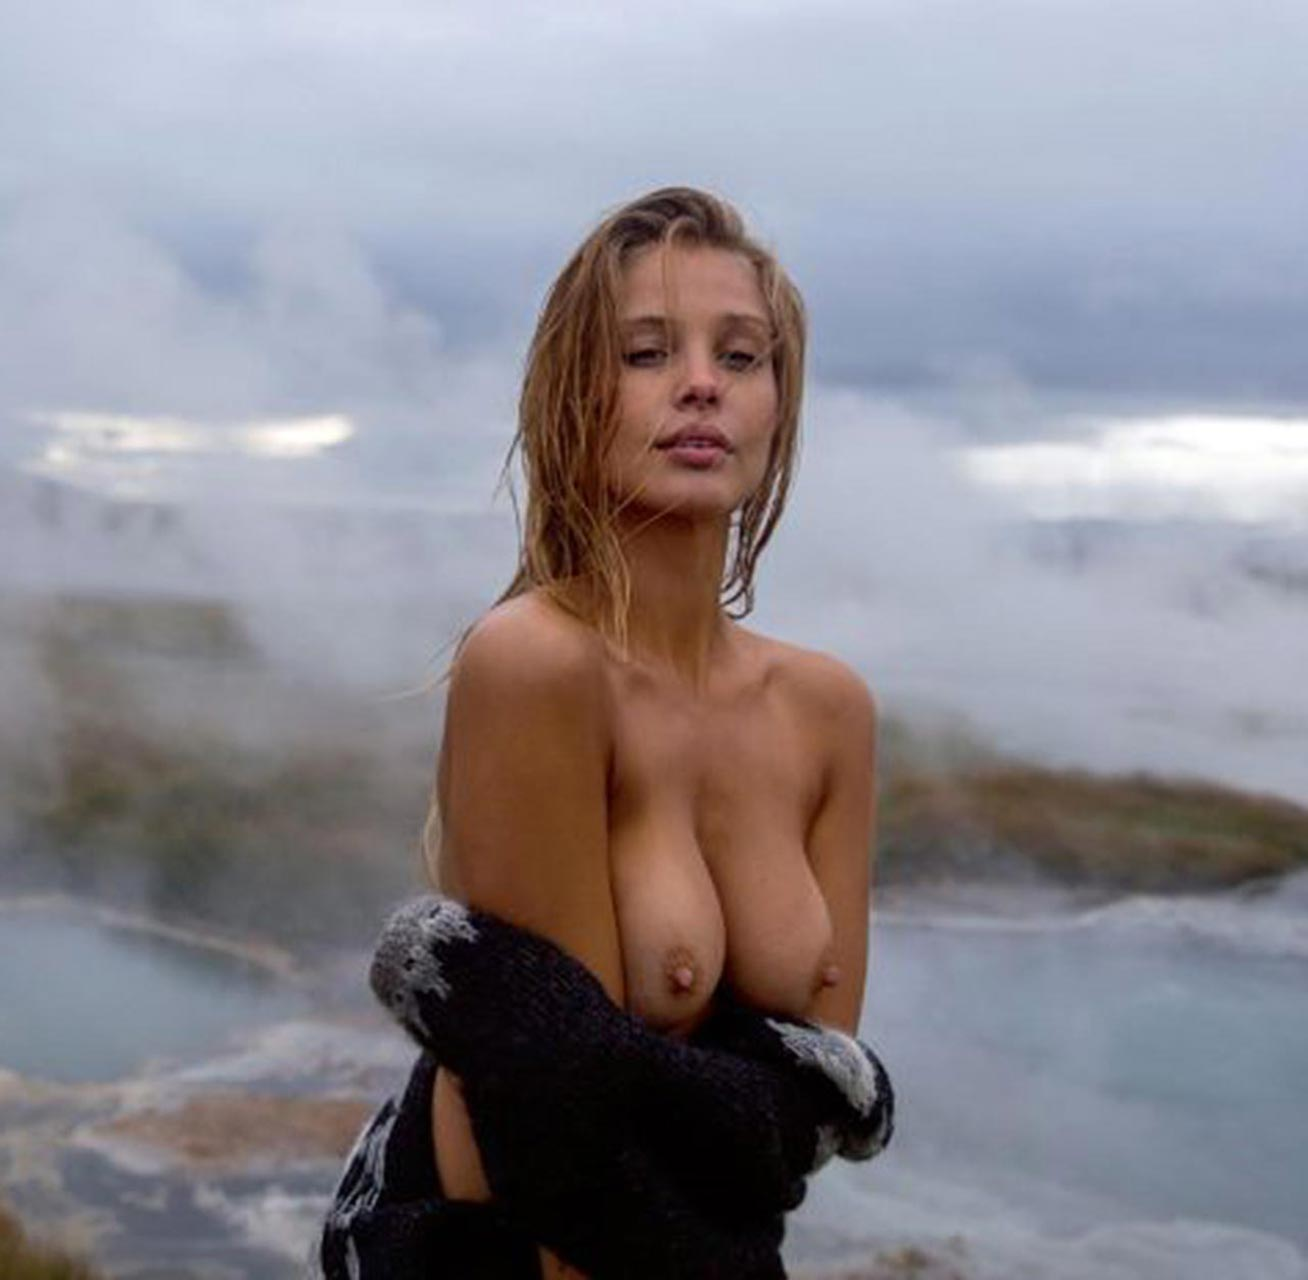 Allie Leggett Miss Kentucky Nude For Playboy Us Magazine -6510